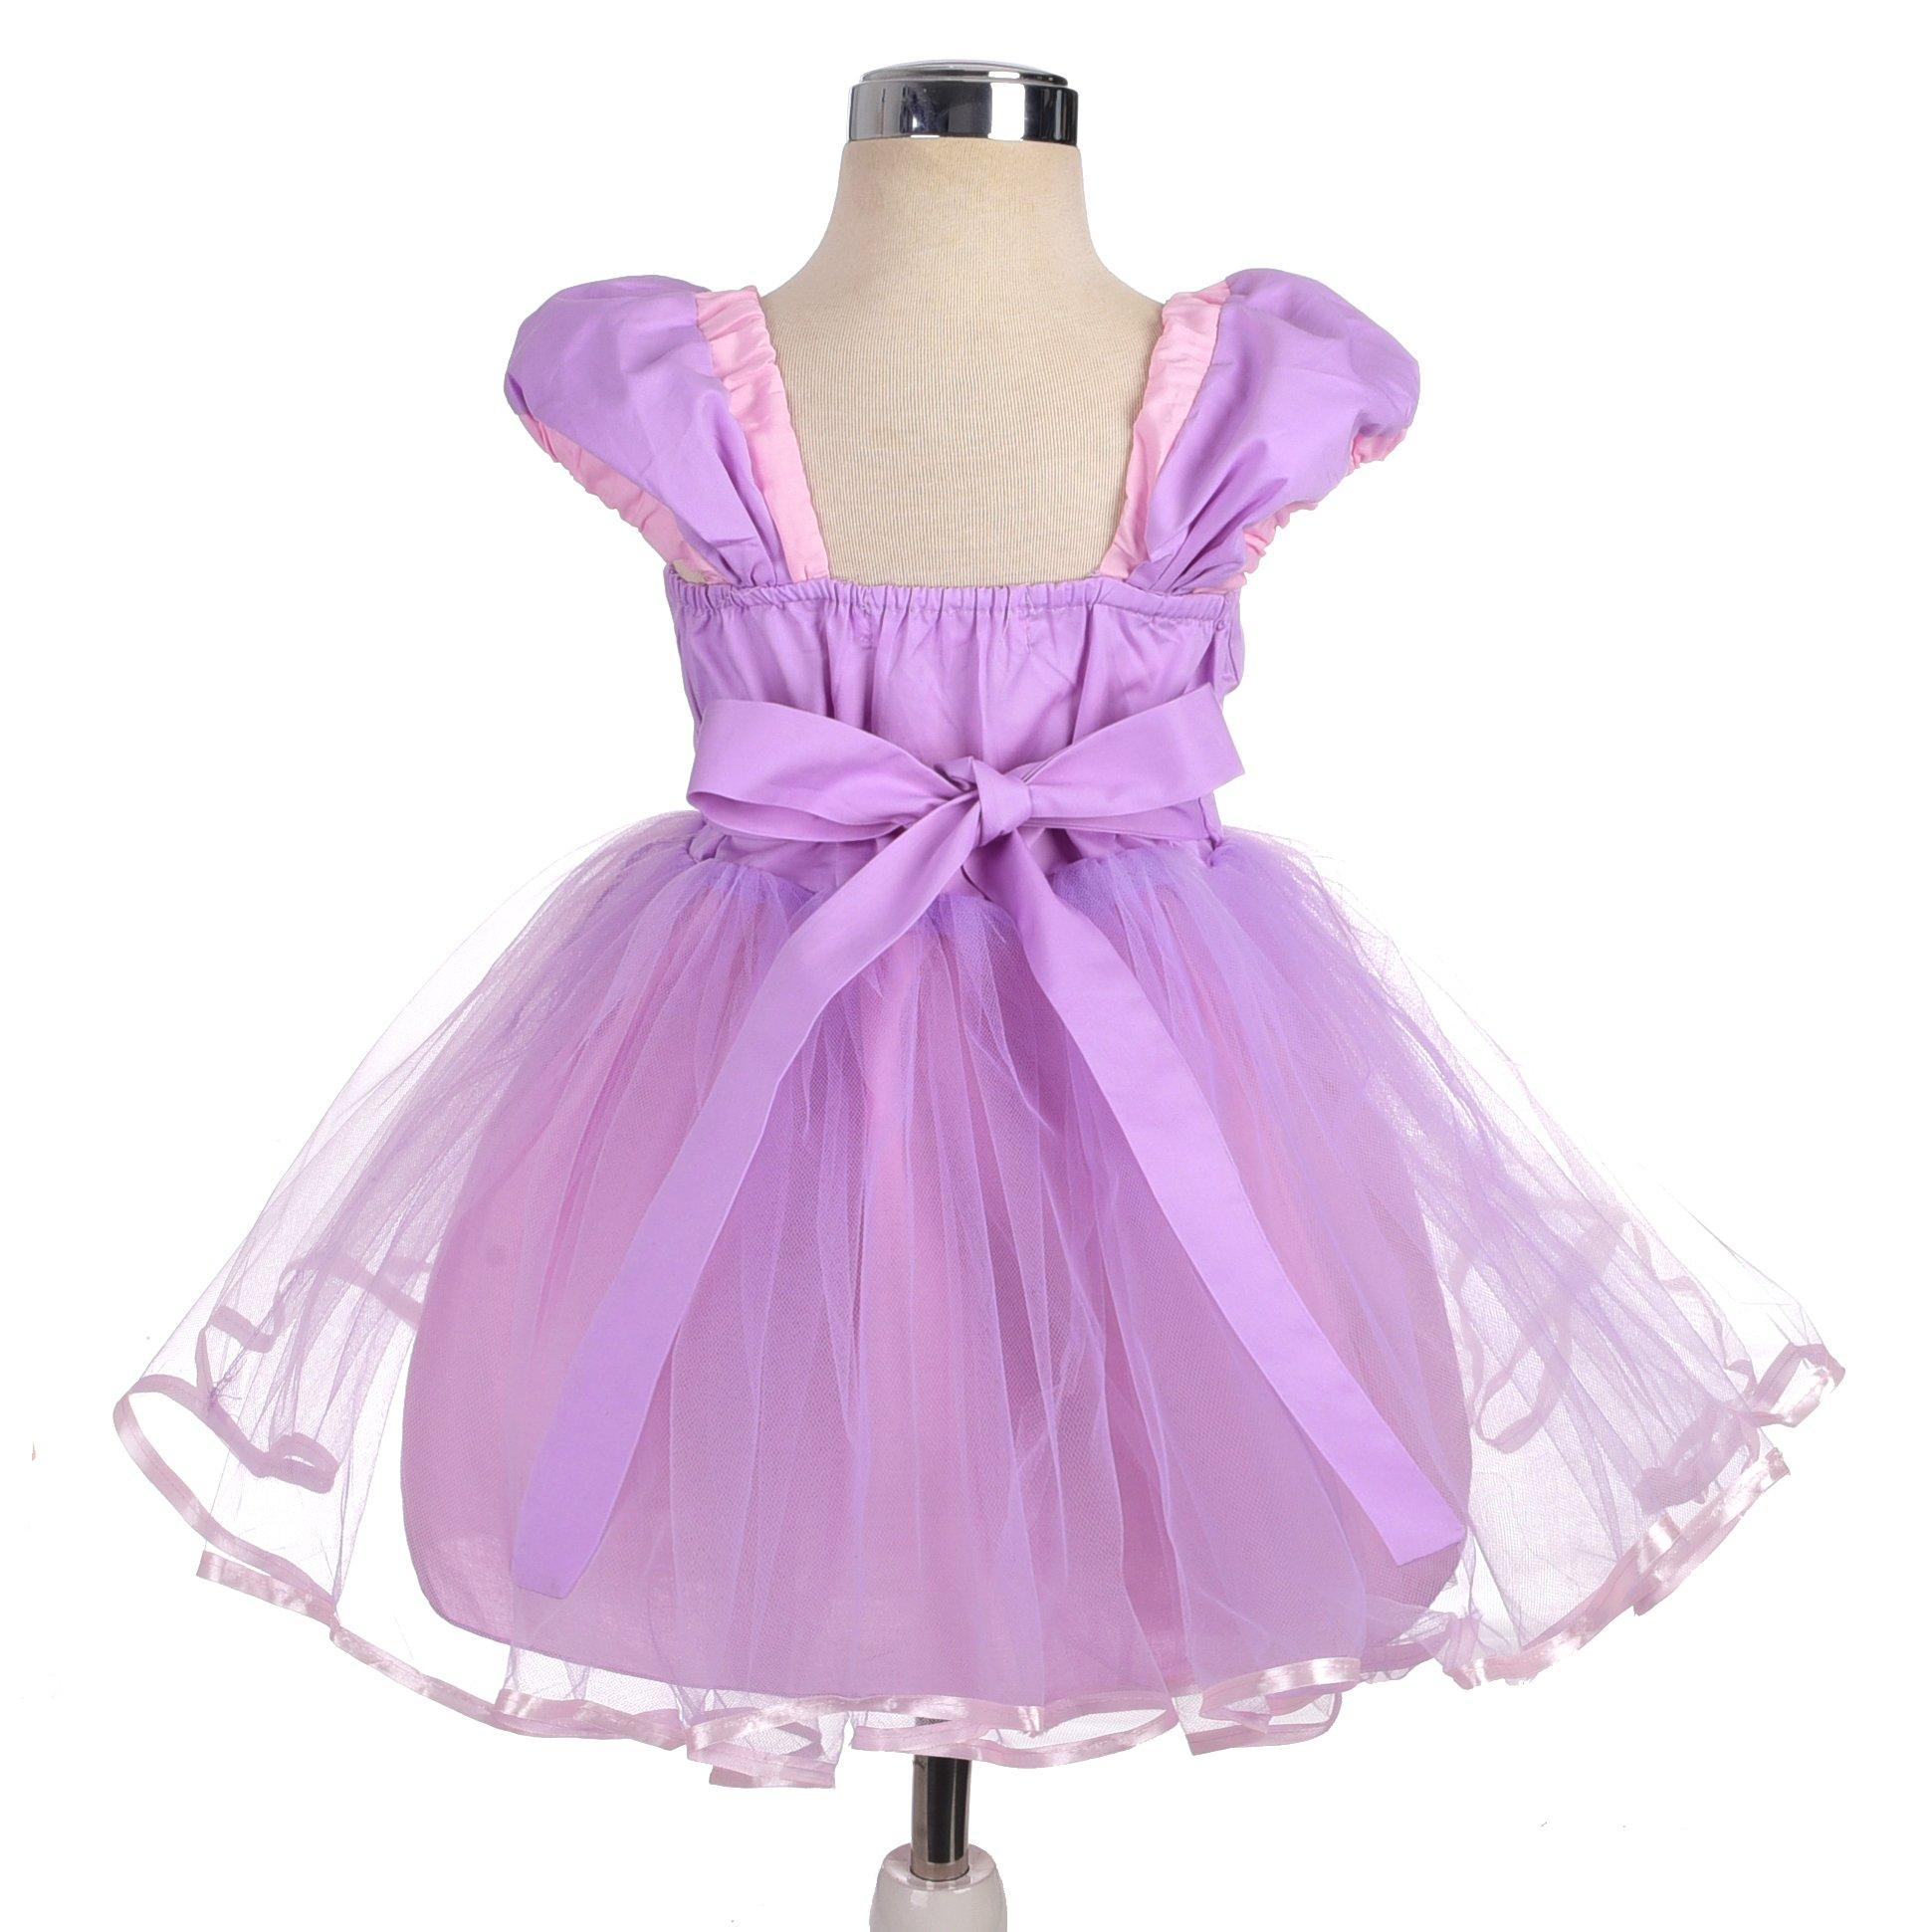 Dressy Daisy Girls Princess Rapunzel Dress Costumes for Toddler Girls Halloween Fancy Party Dress Size 4T by Dressy Daisy (Image #2)